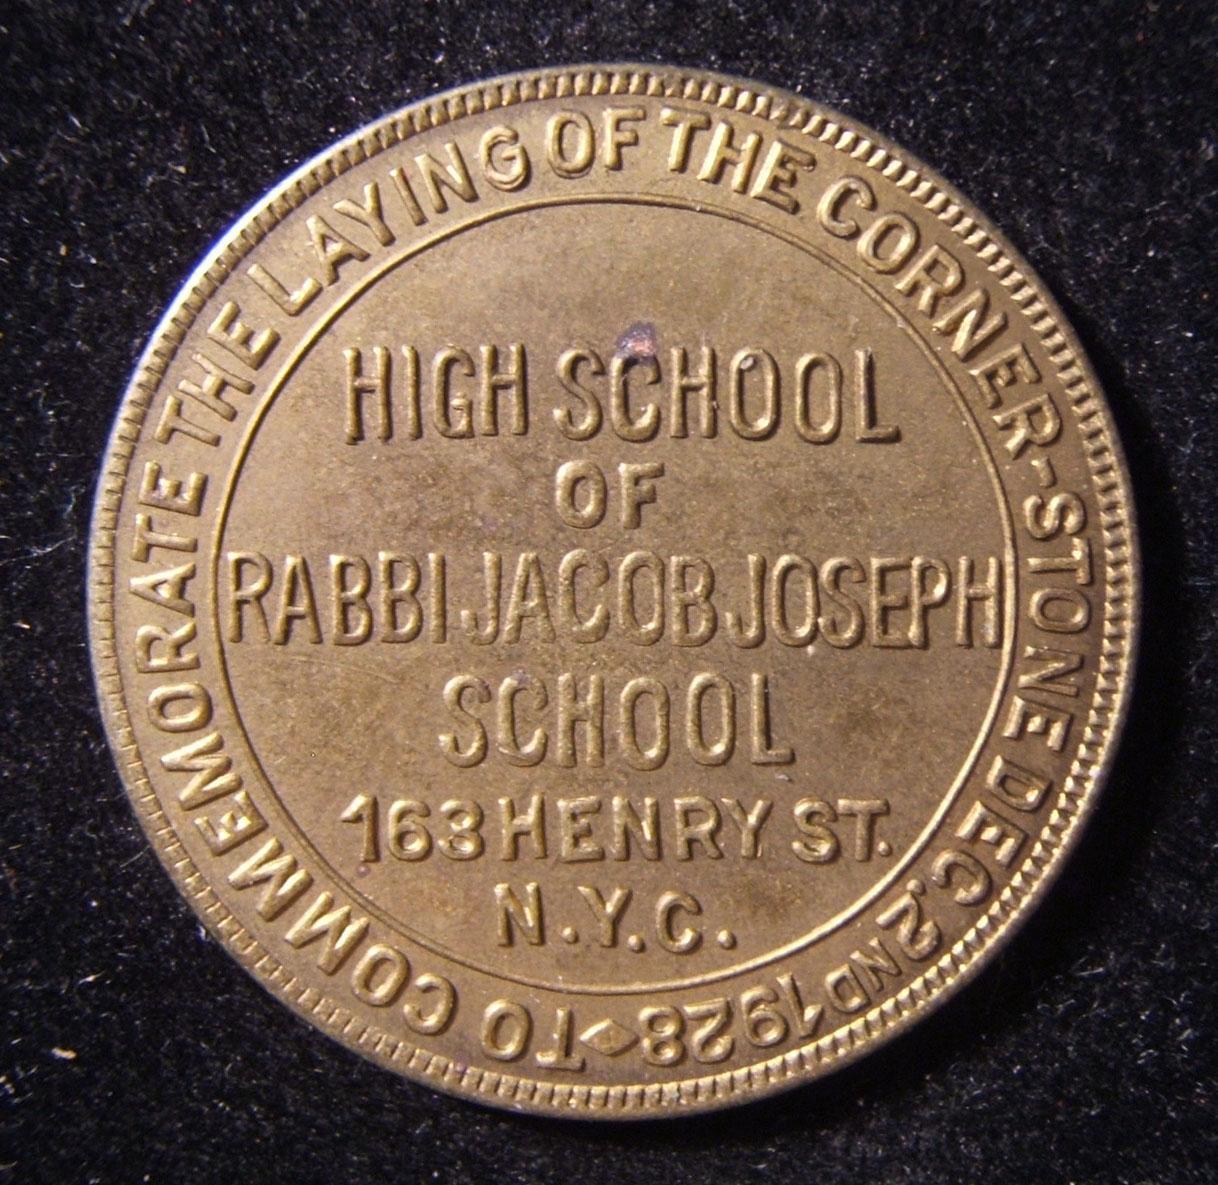 American Jewish Rabbi Jacob Joseph High School Judaica token all in Hebrew, 1928